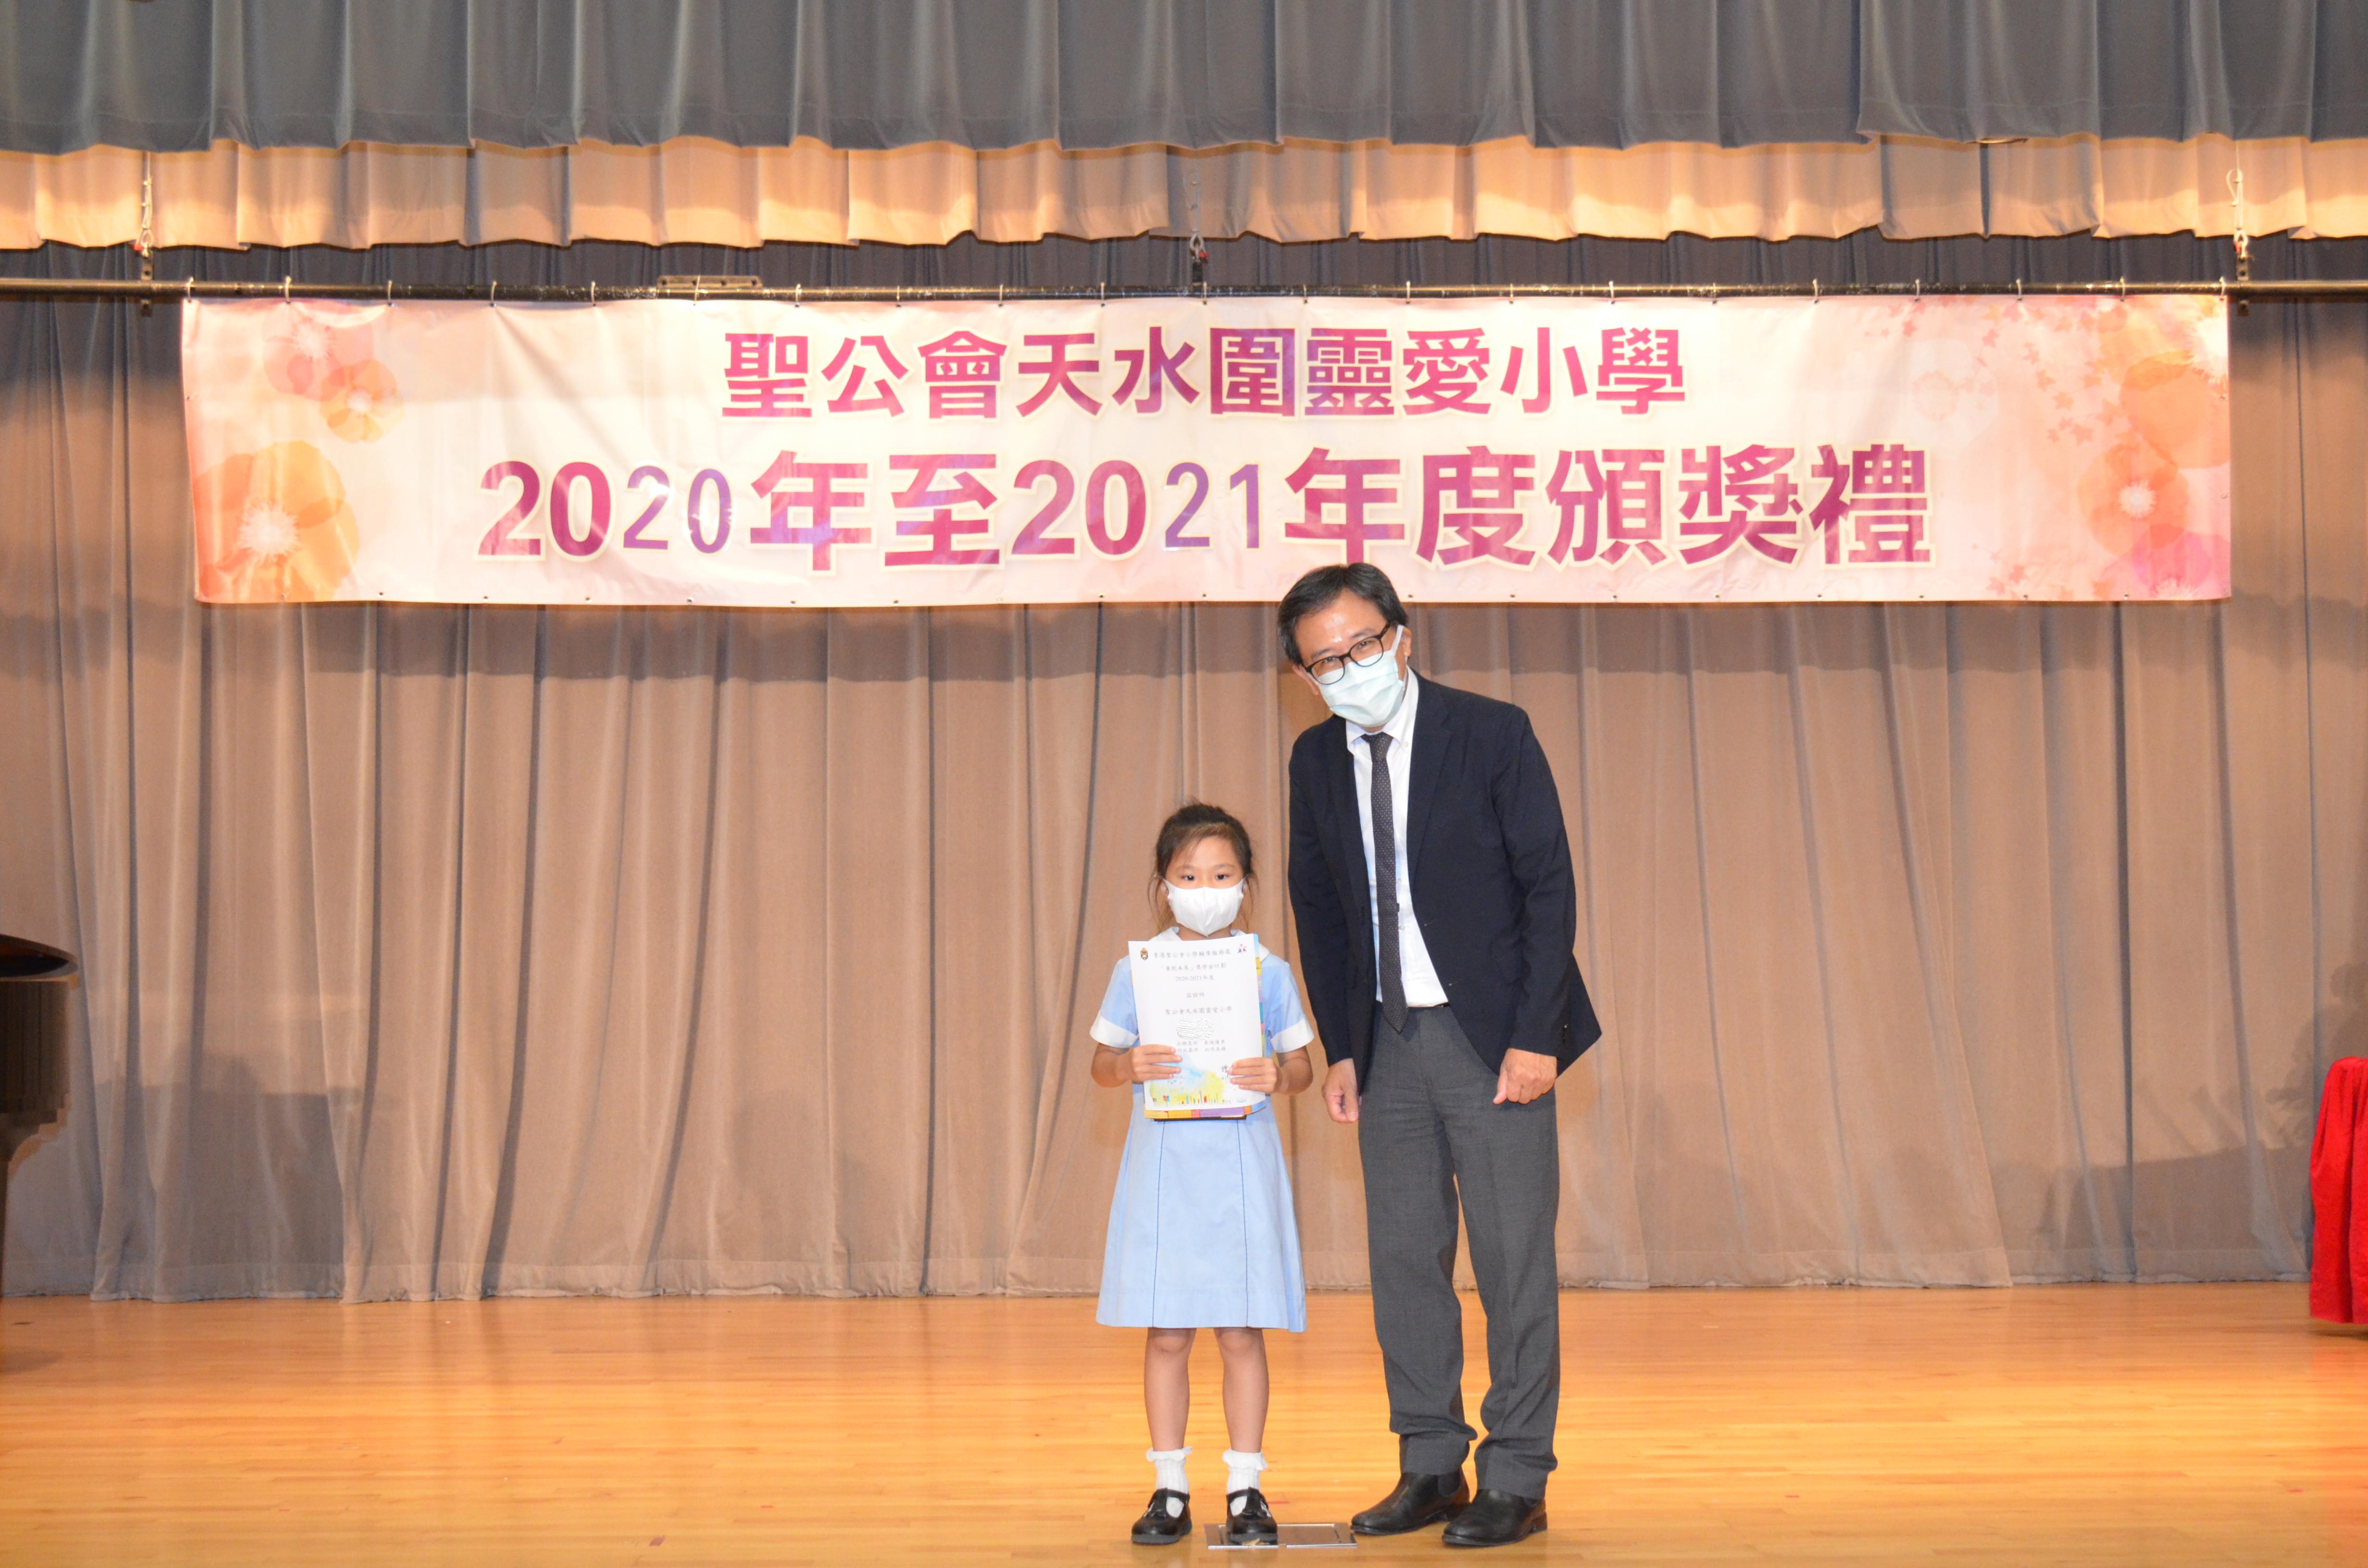 https://skhtswlo.edu.hk/sites/default/files/dsc_3480.png